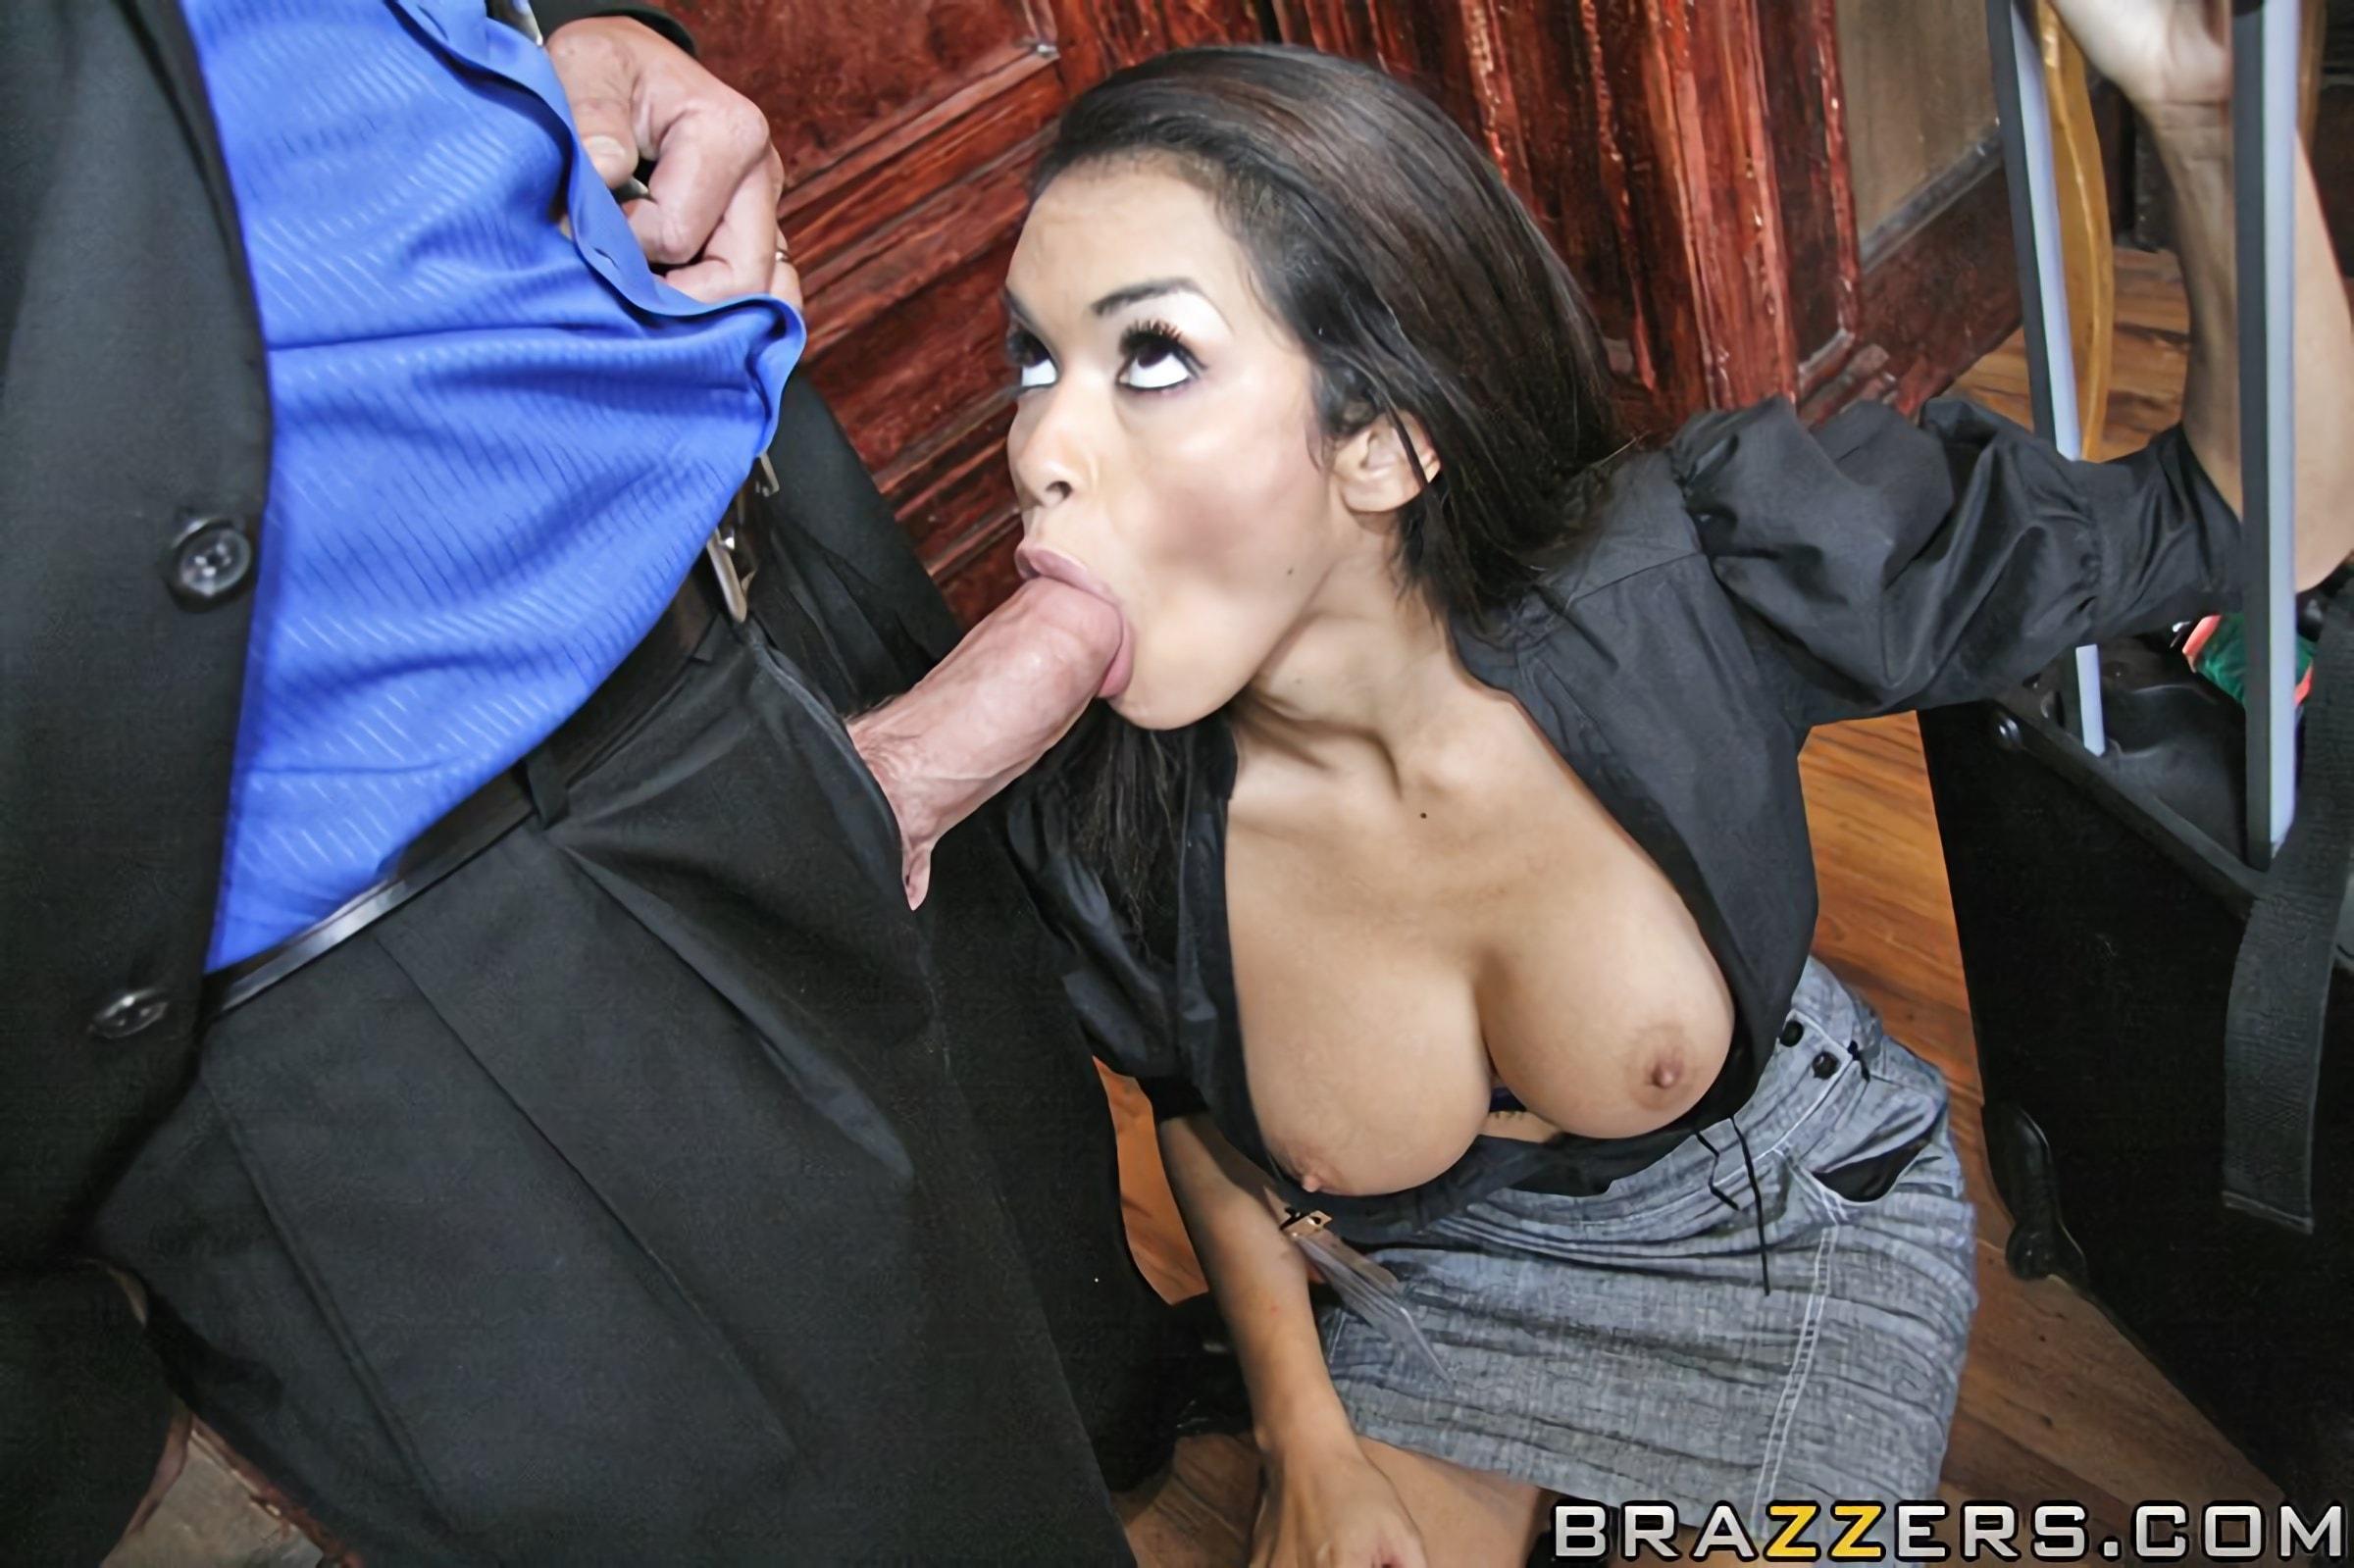 daisy marie big tits at work № 4086